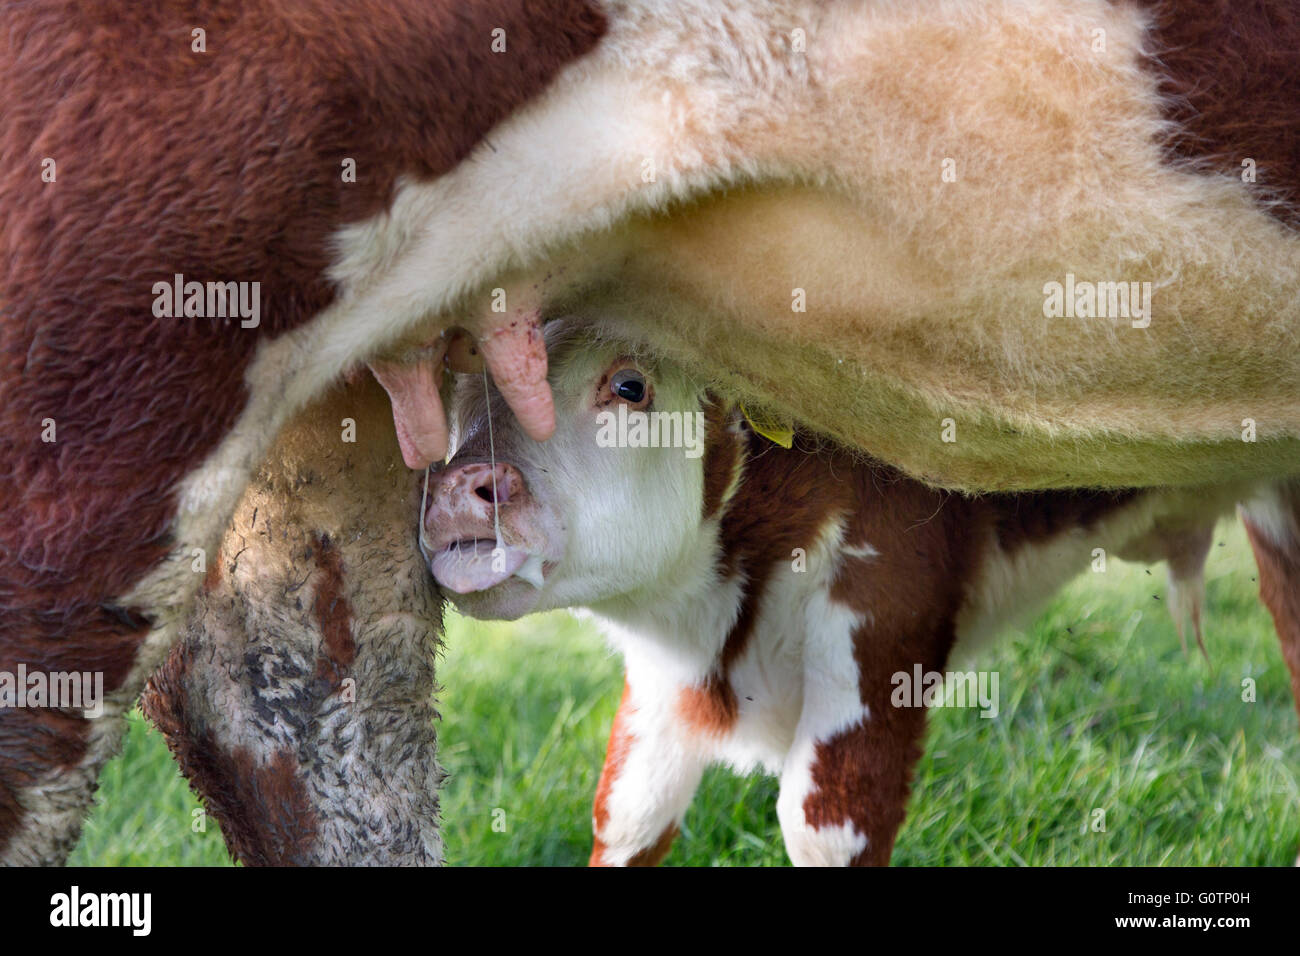 Terneros Hereford cochinillo de leche de vaca Foto de stock